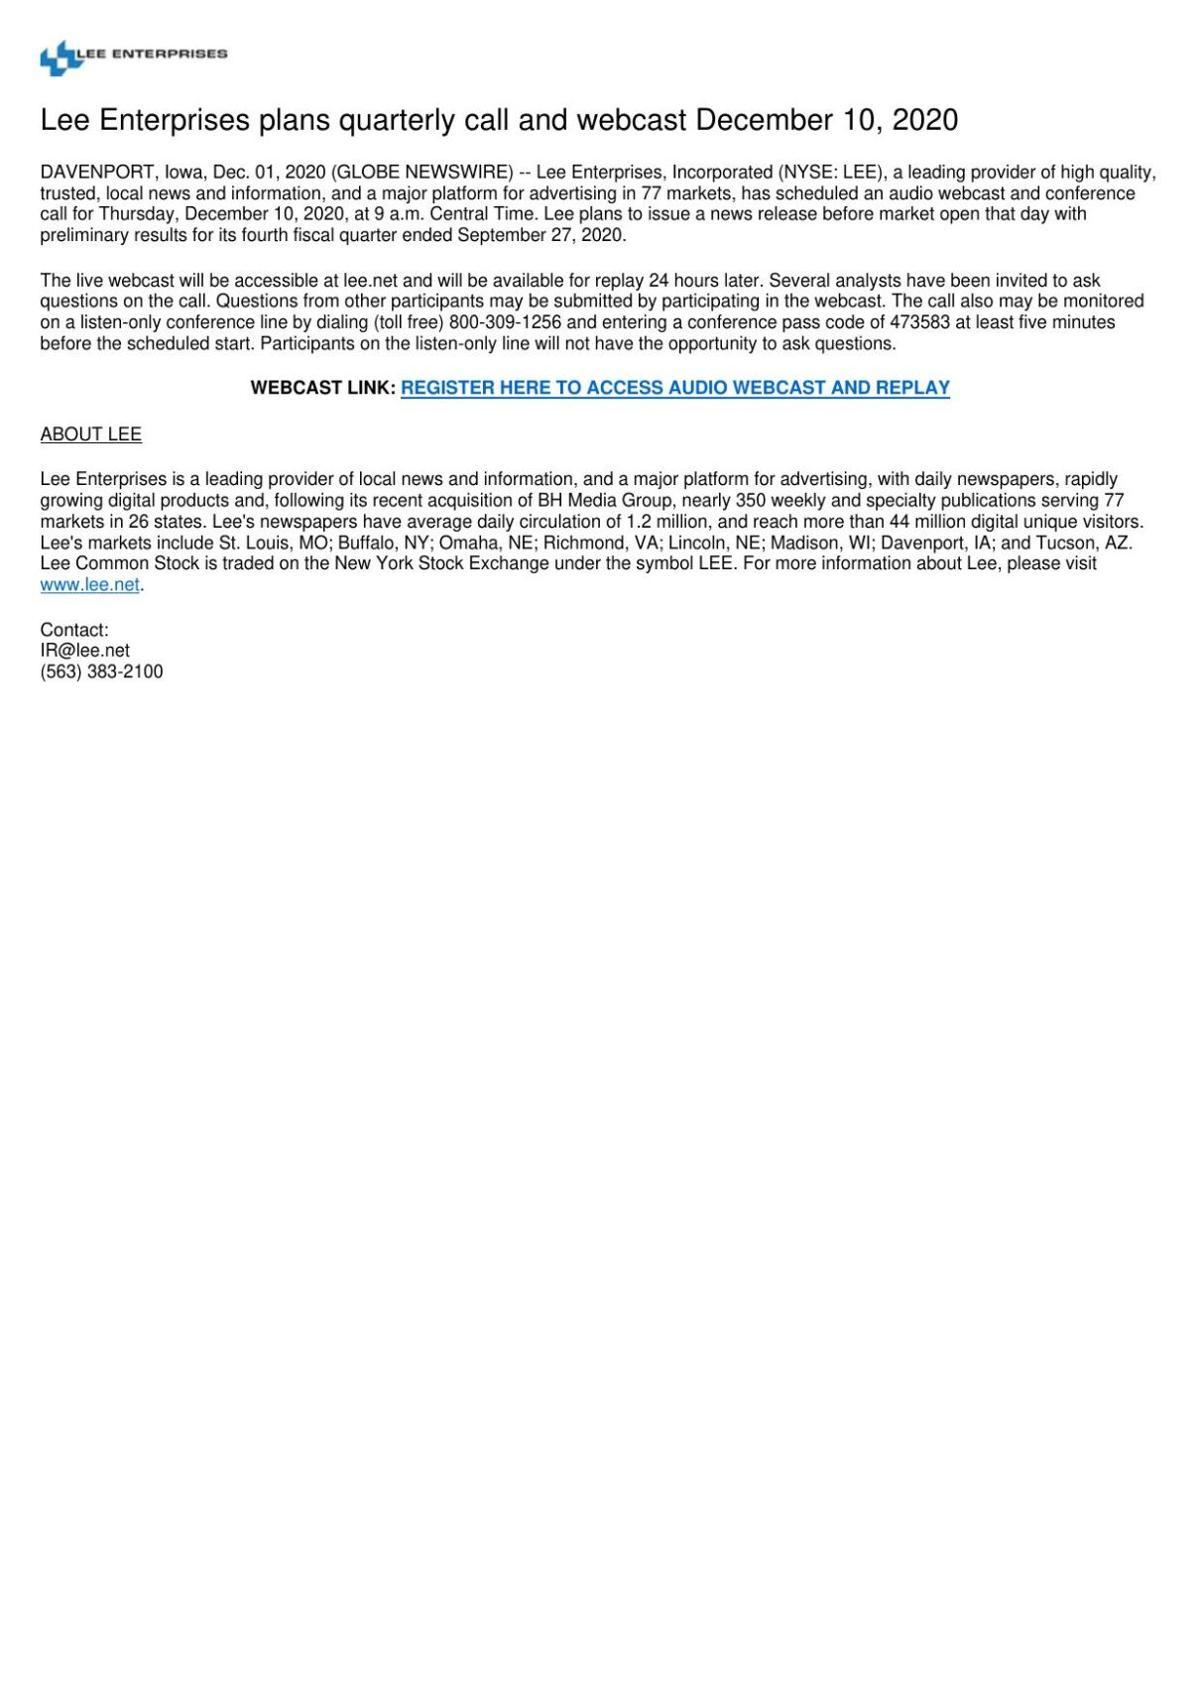 Lee Enterprises plans quarterly call and webcast December 10, 2020